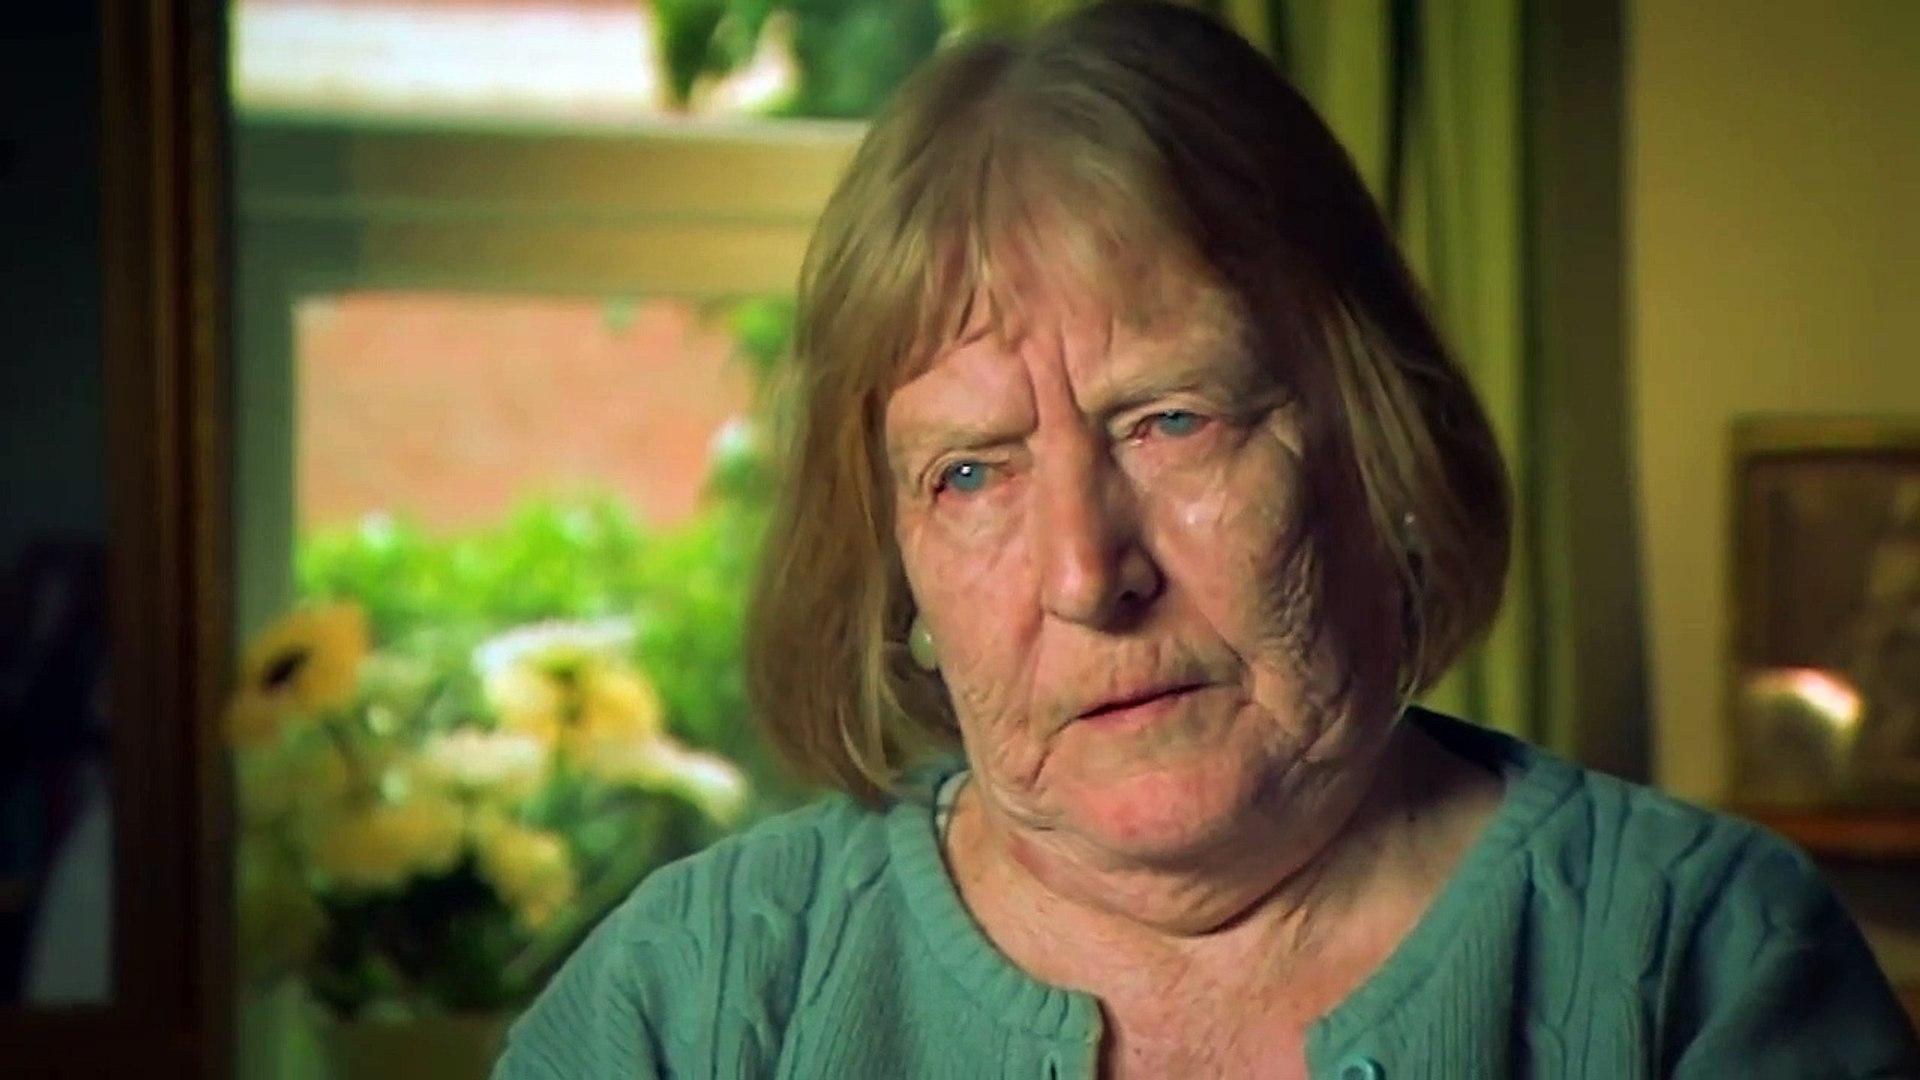 How Women Dealt With The Horror Of War | Shooting The War (World War 2 Documentary) | Timeline